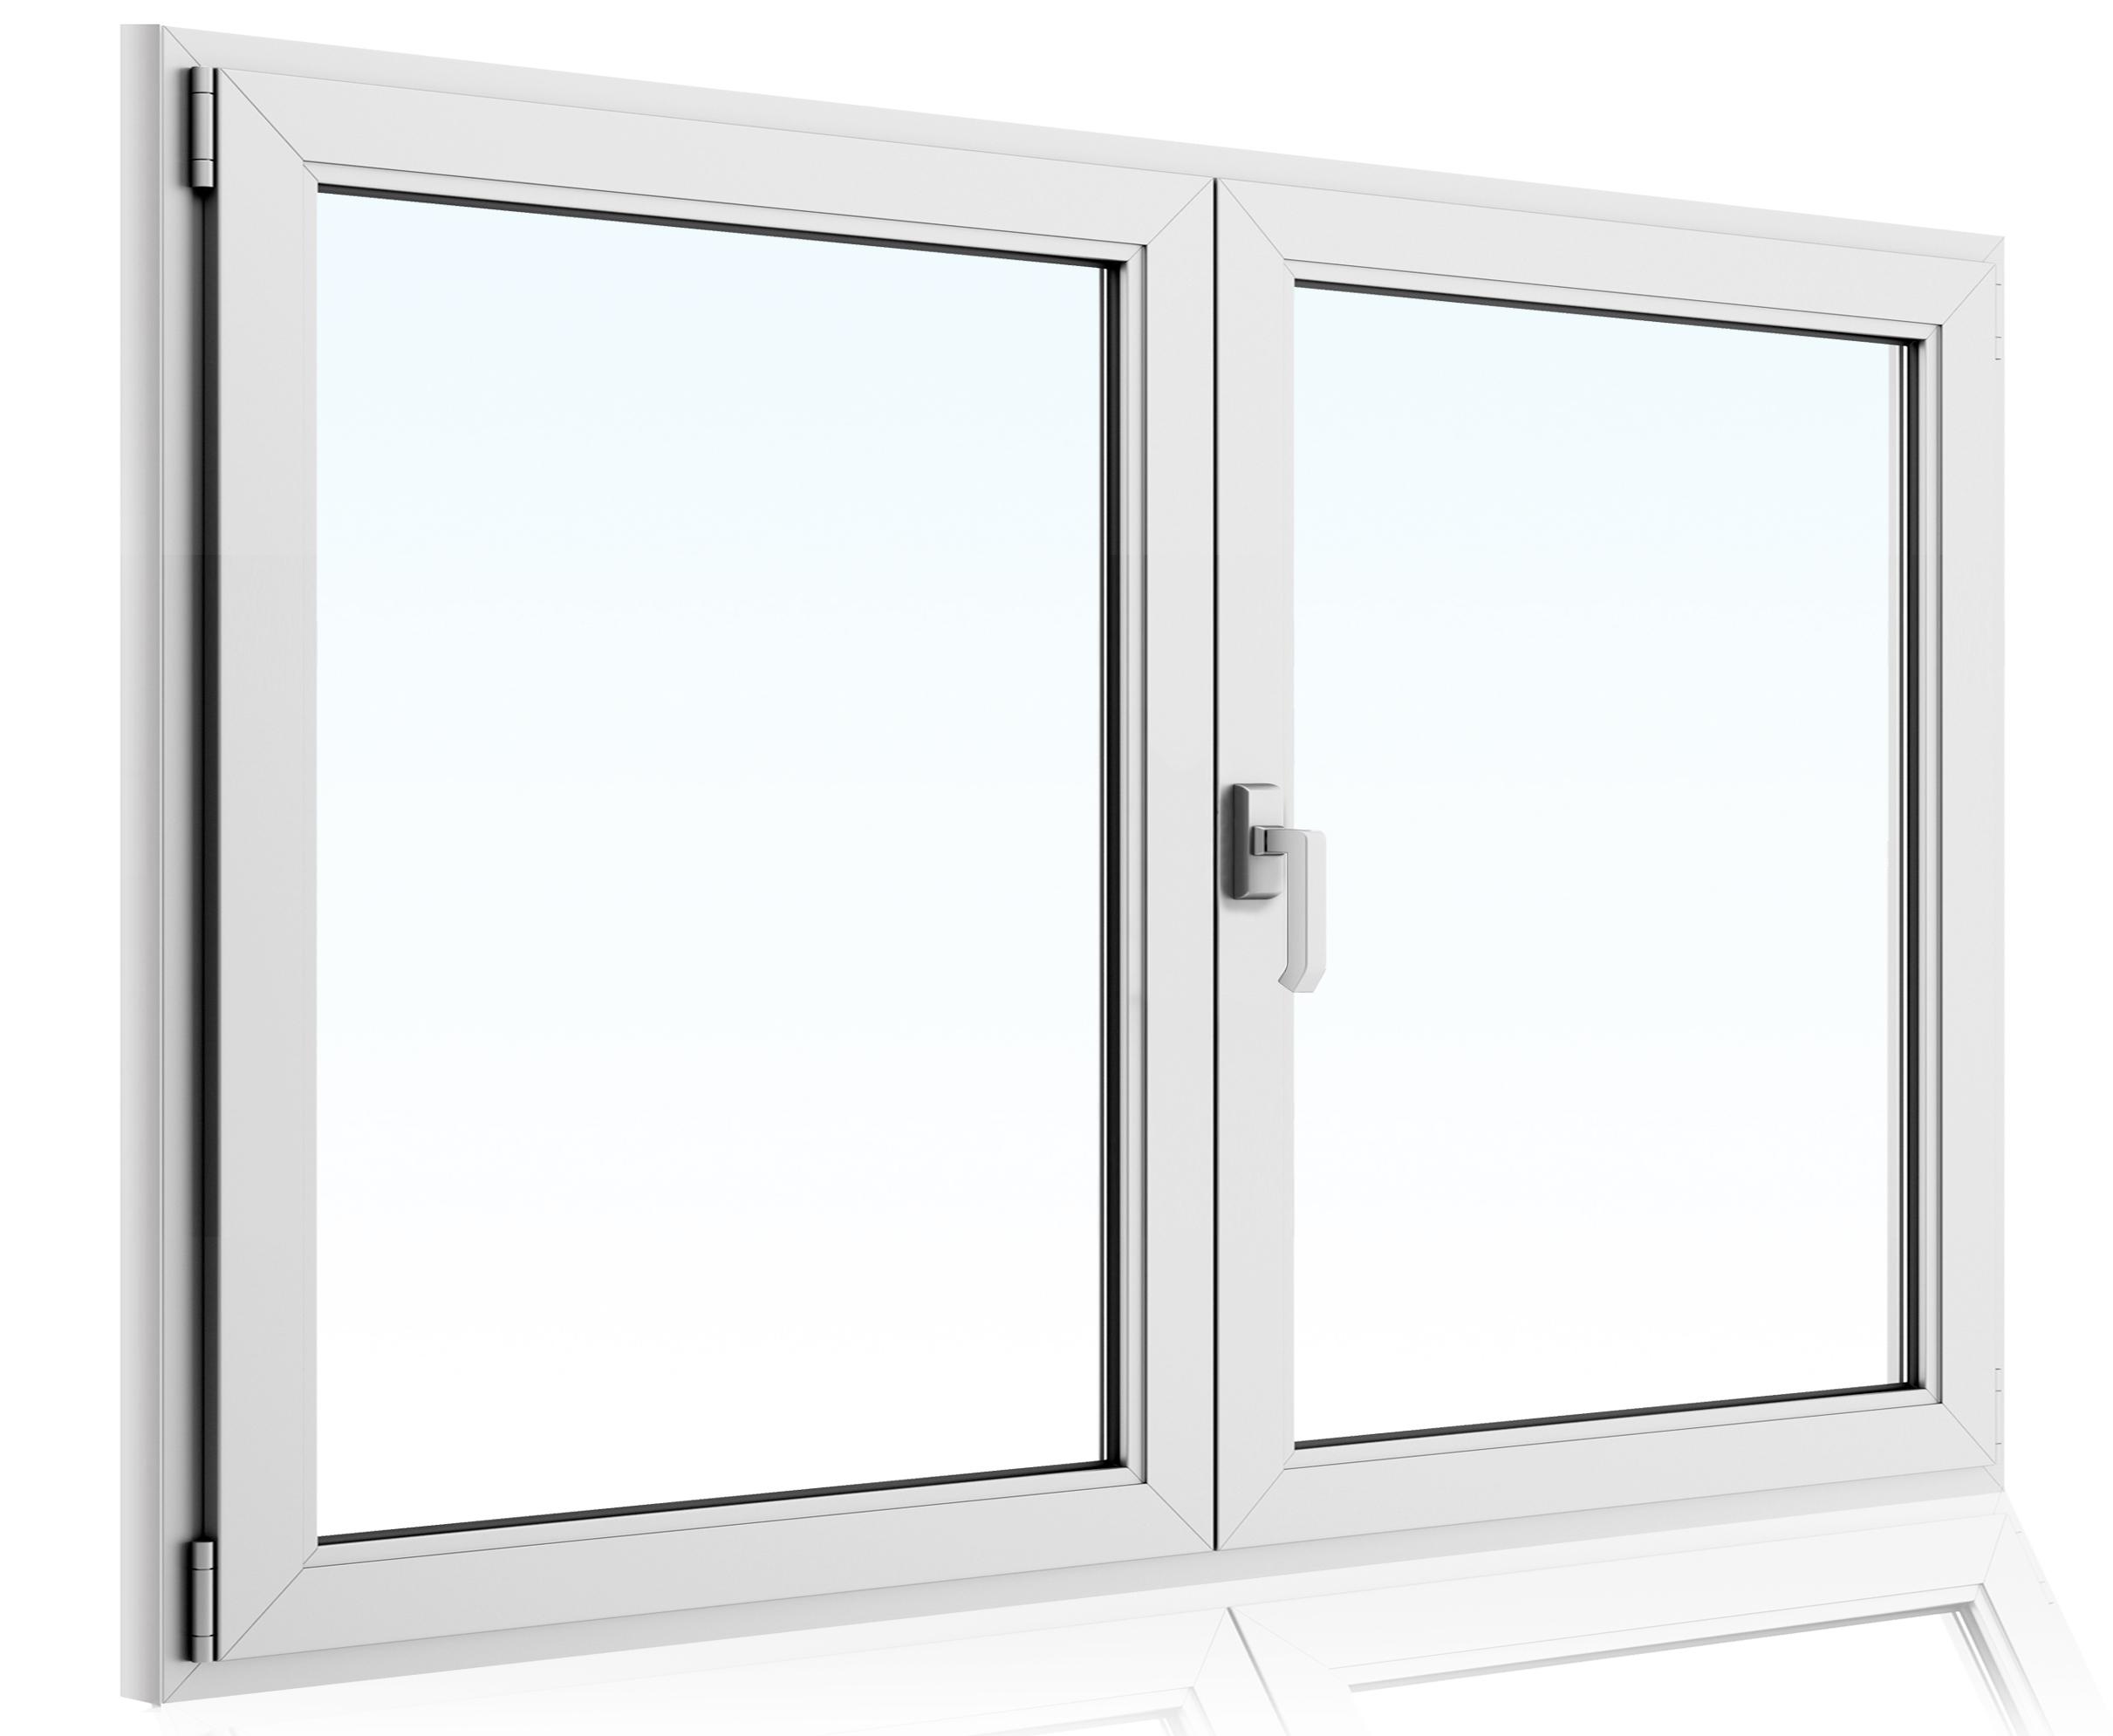 kunstofffenster fenster pvc 2 fl gel dreh kipp 230 cm breite alle h he wei ebay. Black Bedroom Furniture Sets. Home Design Ideas